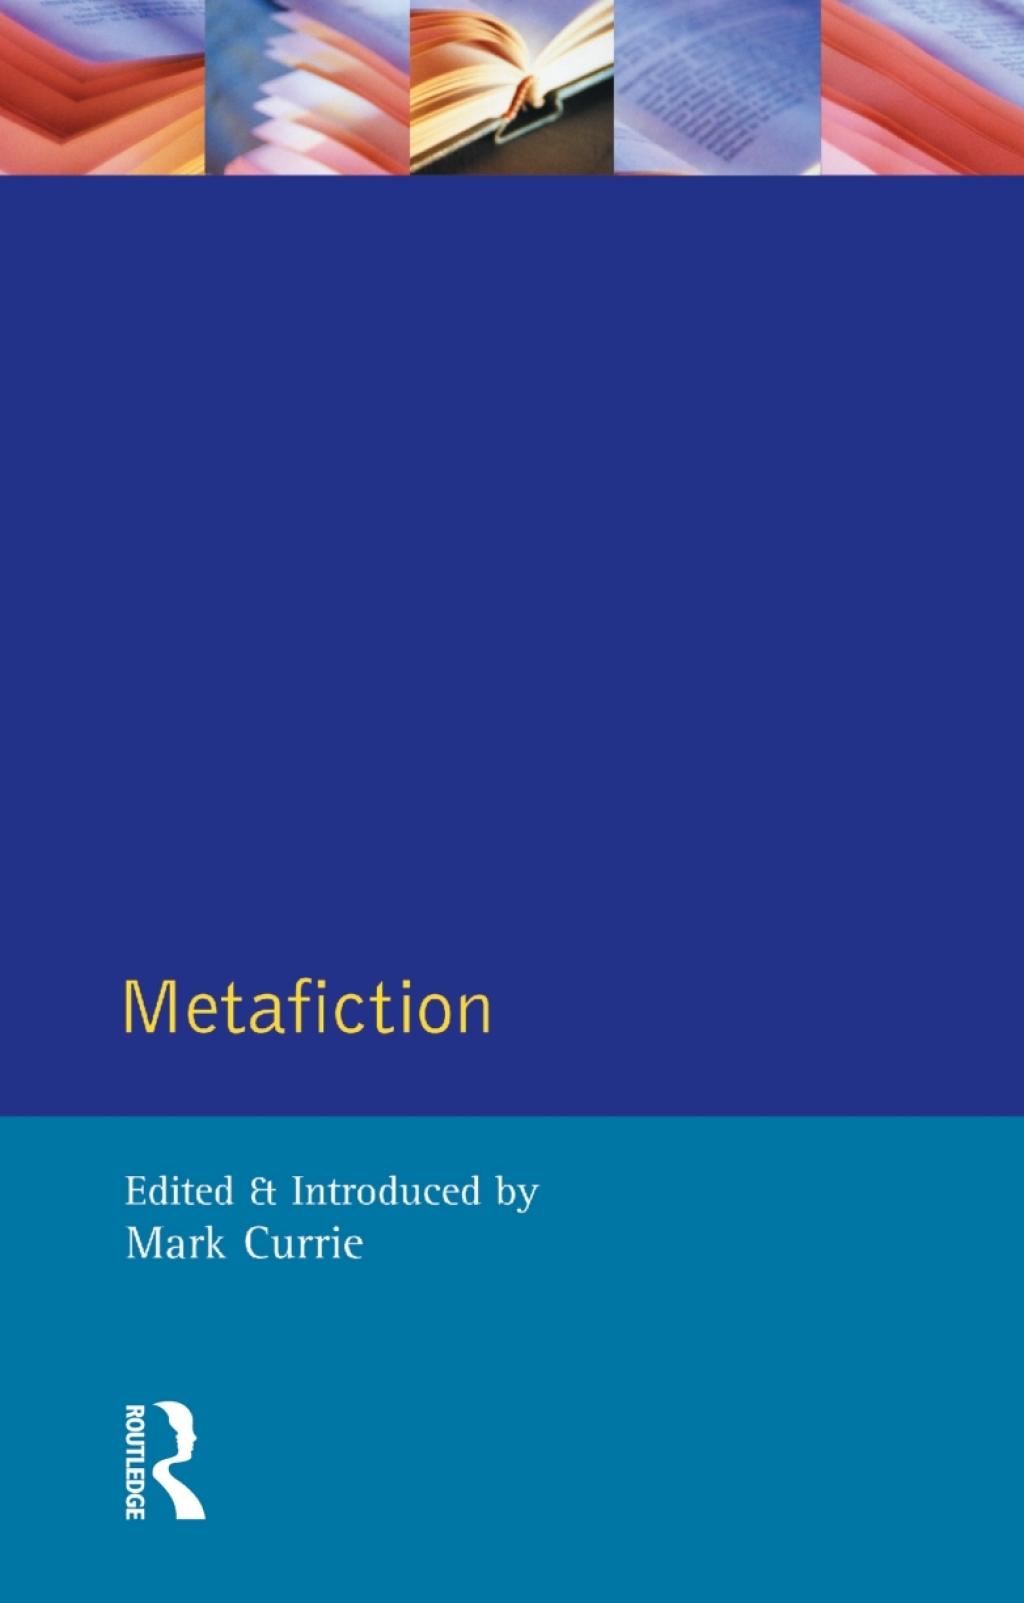 Metafiction (eBook)